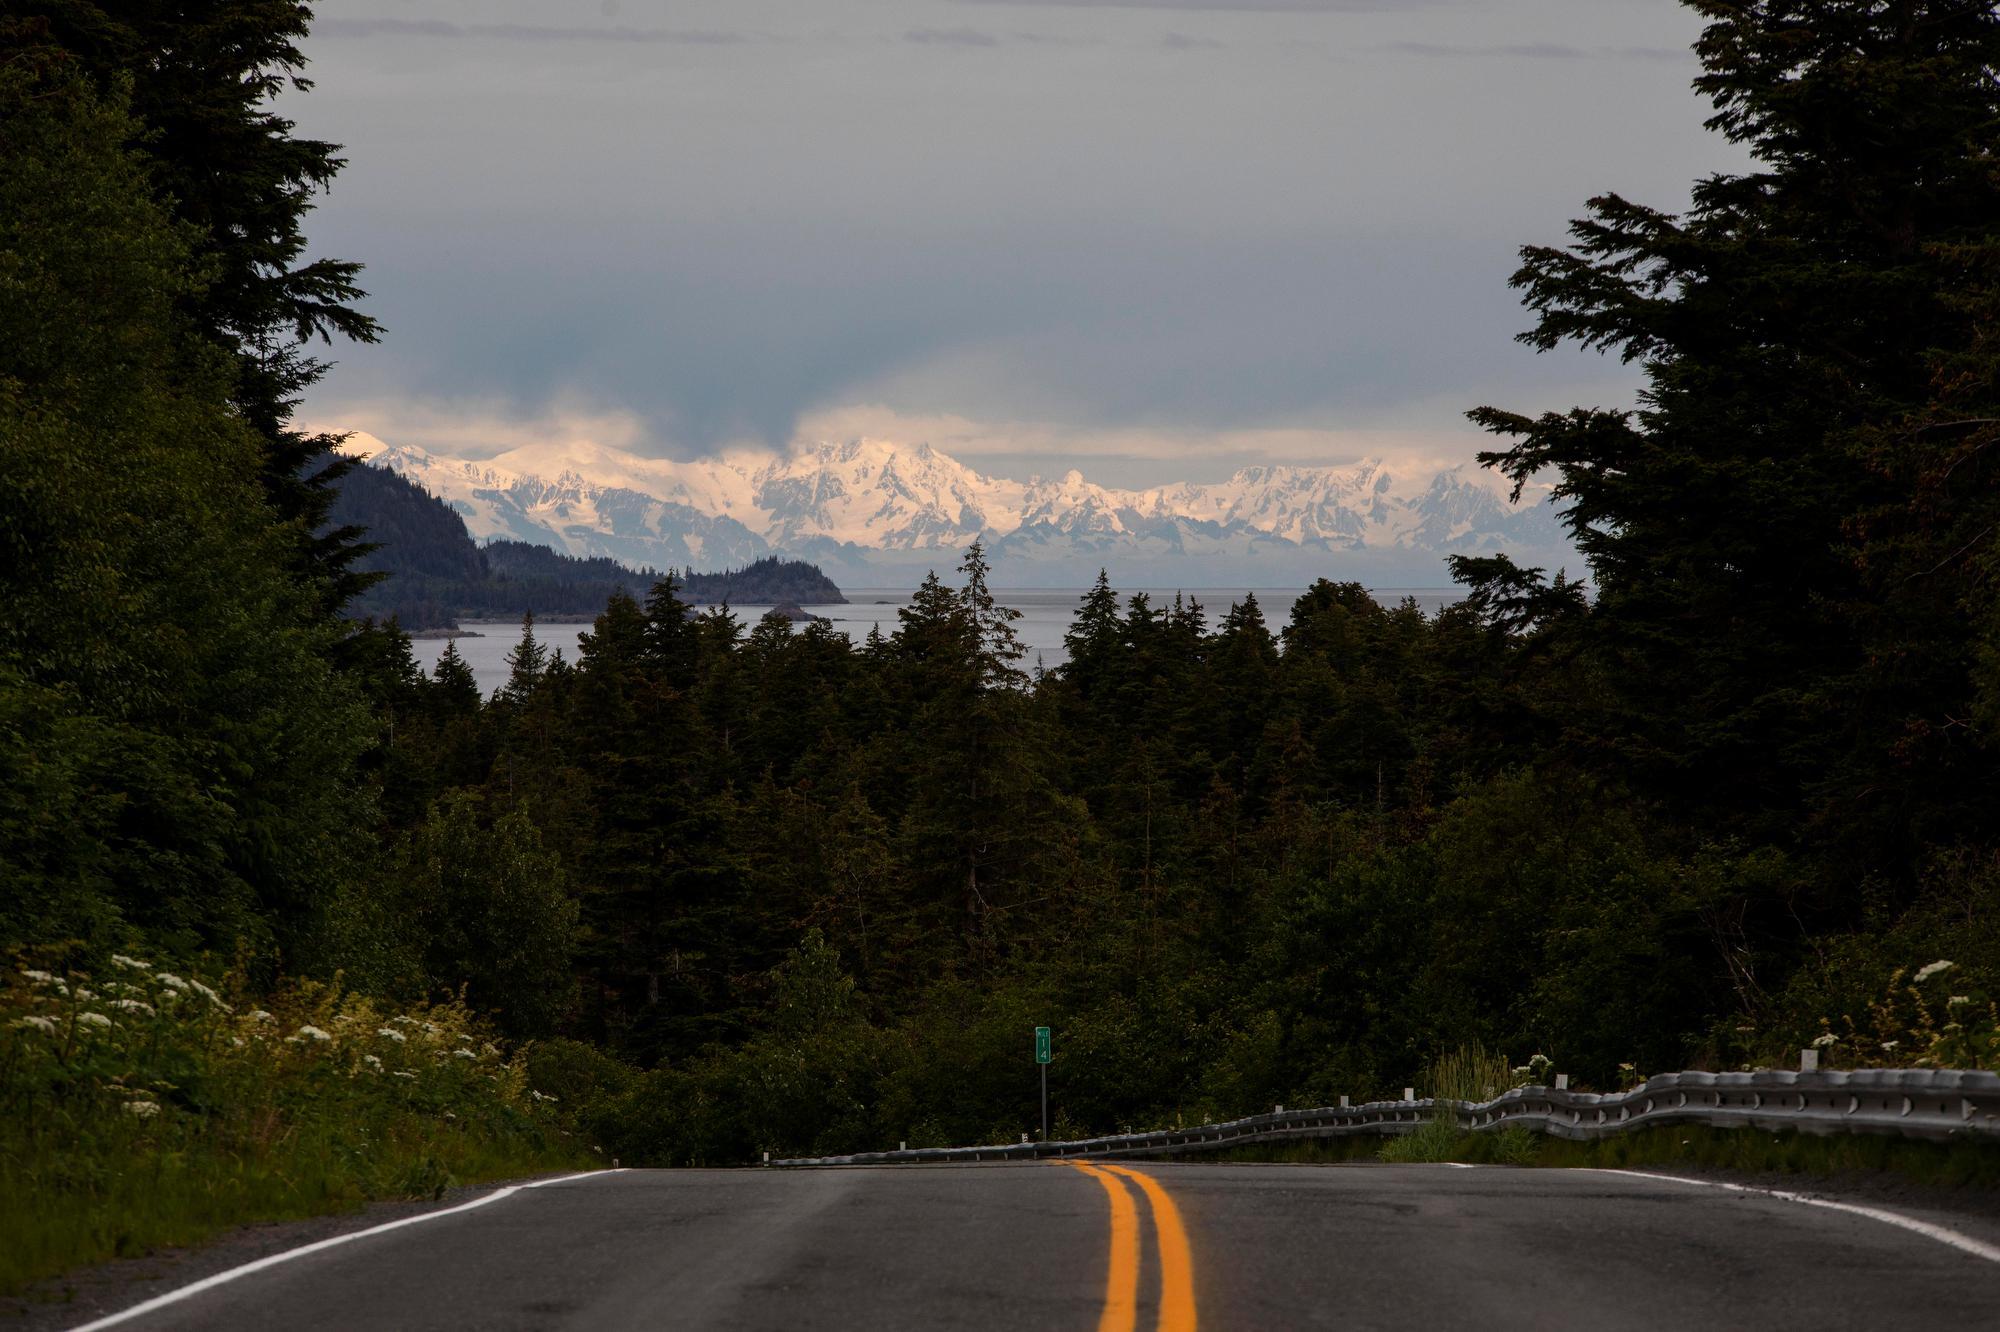 Looking towards Hope, Alaska. (Rugile Kaladyte)